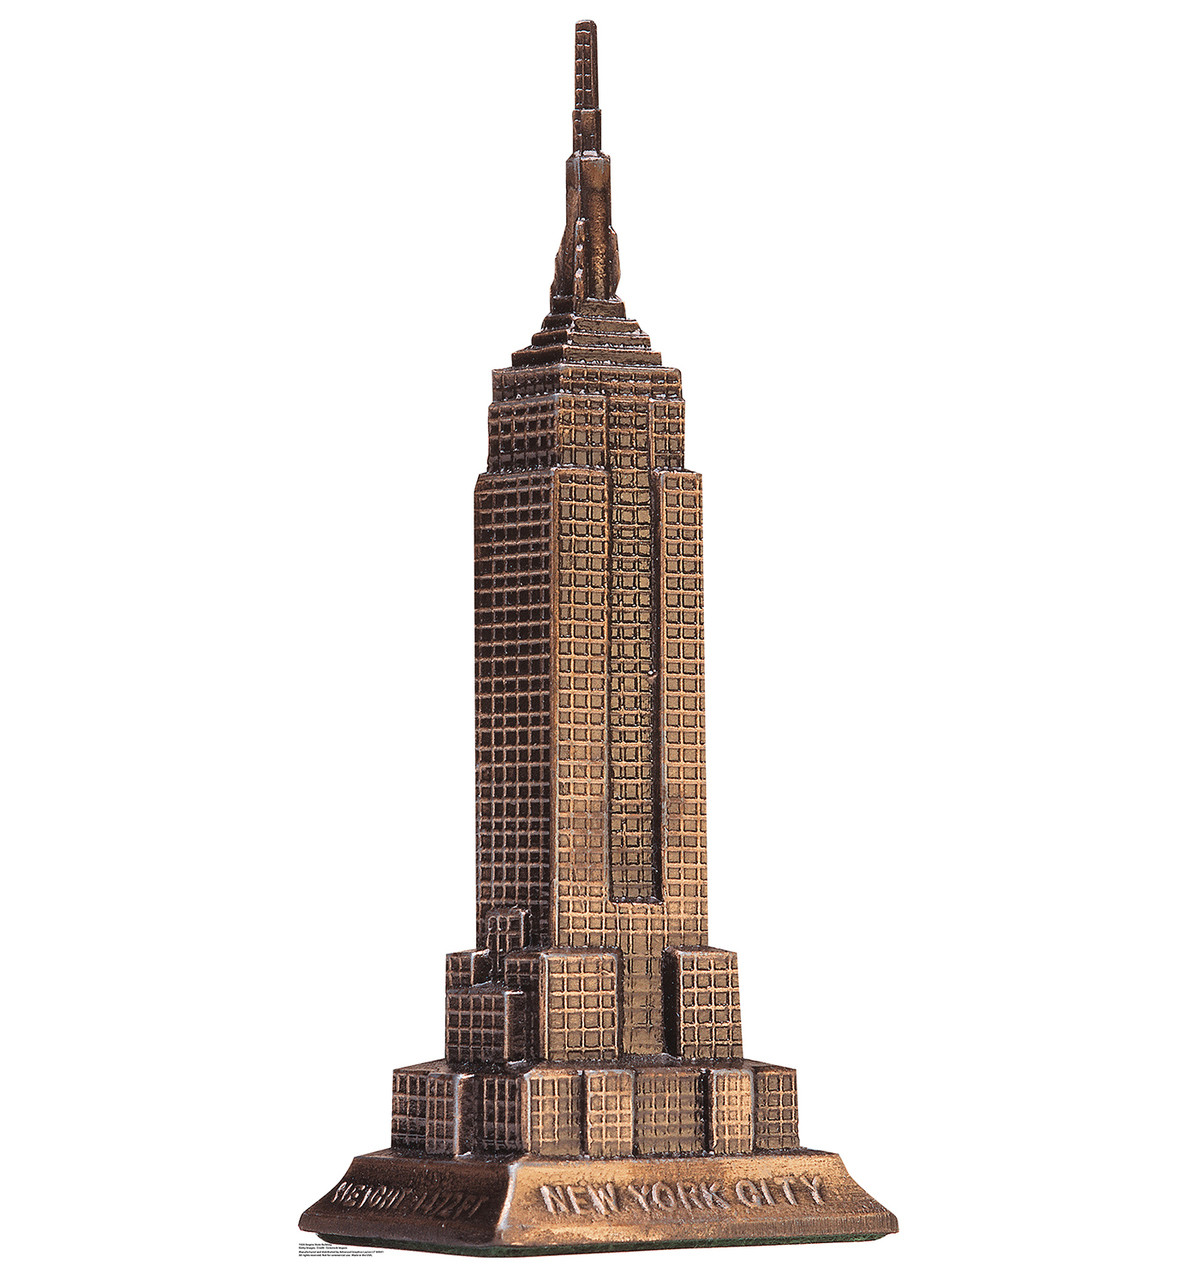 Life-size Empire State Building Cardboard Standup | Cardboard Cutout